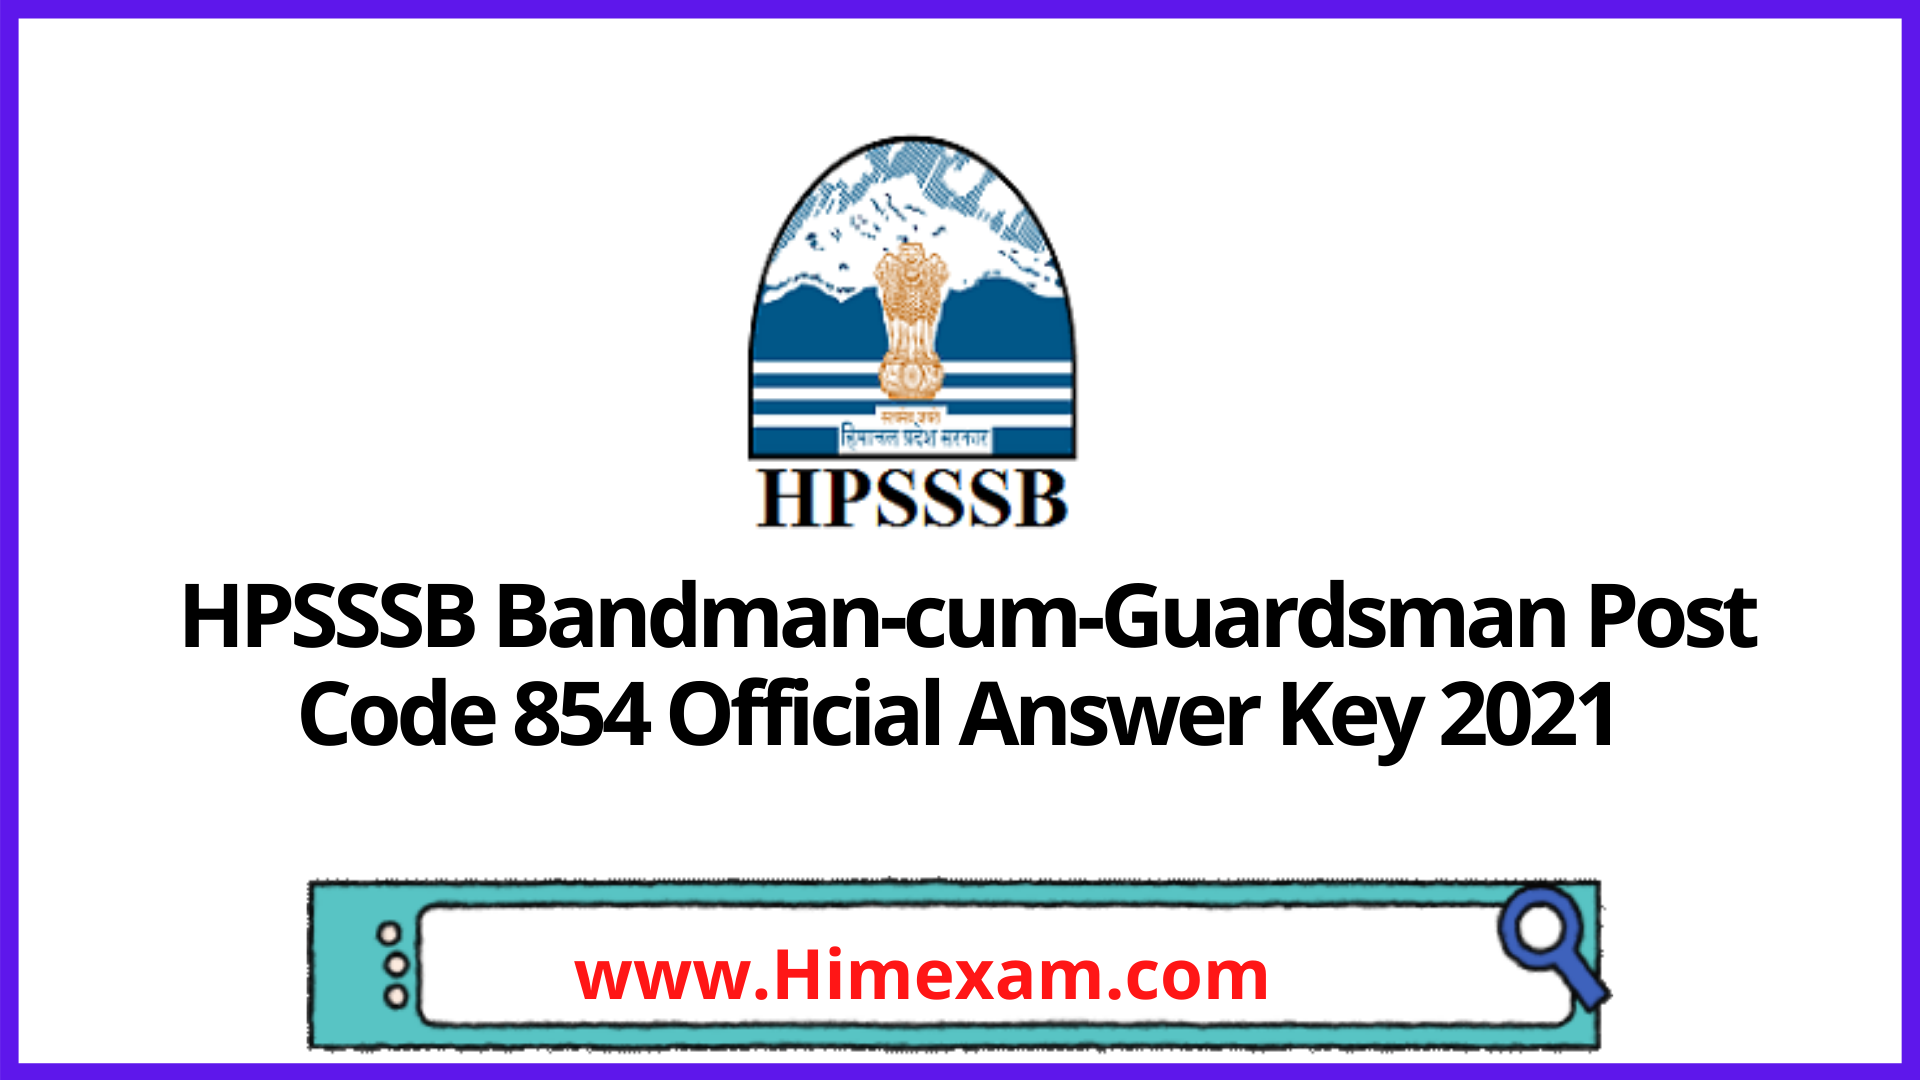 HPSSSB  Bandman-cum-Guardsman Post Code 854 Official Answer Key 2021